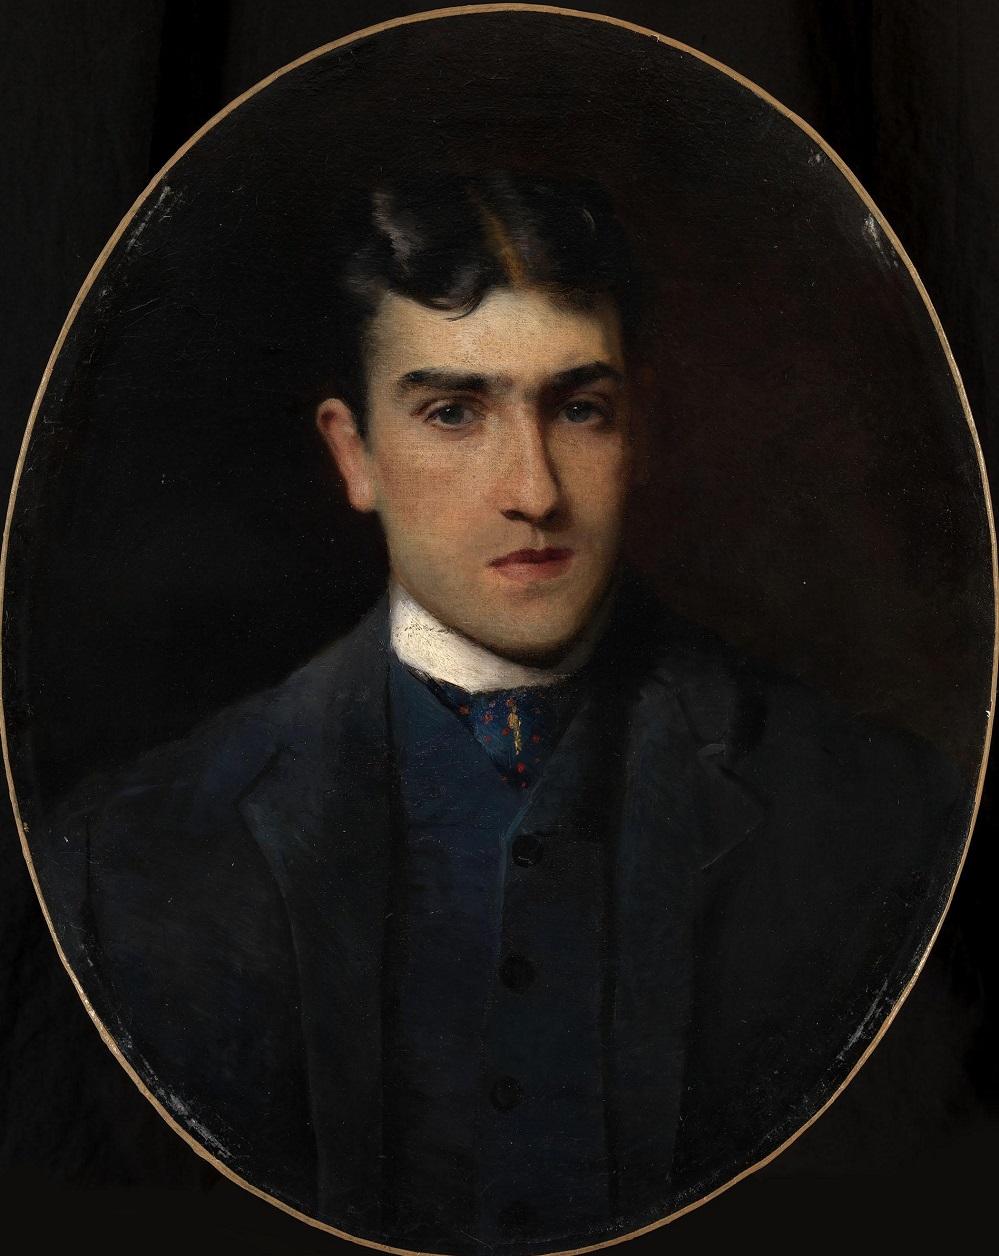 Portrait of Lucien Guitry.